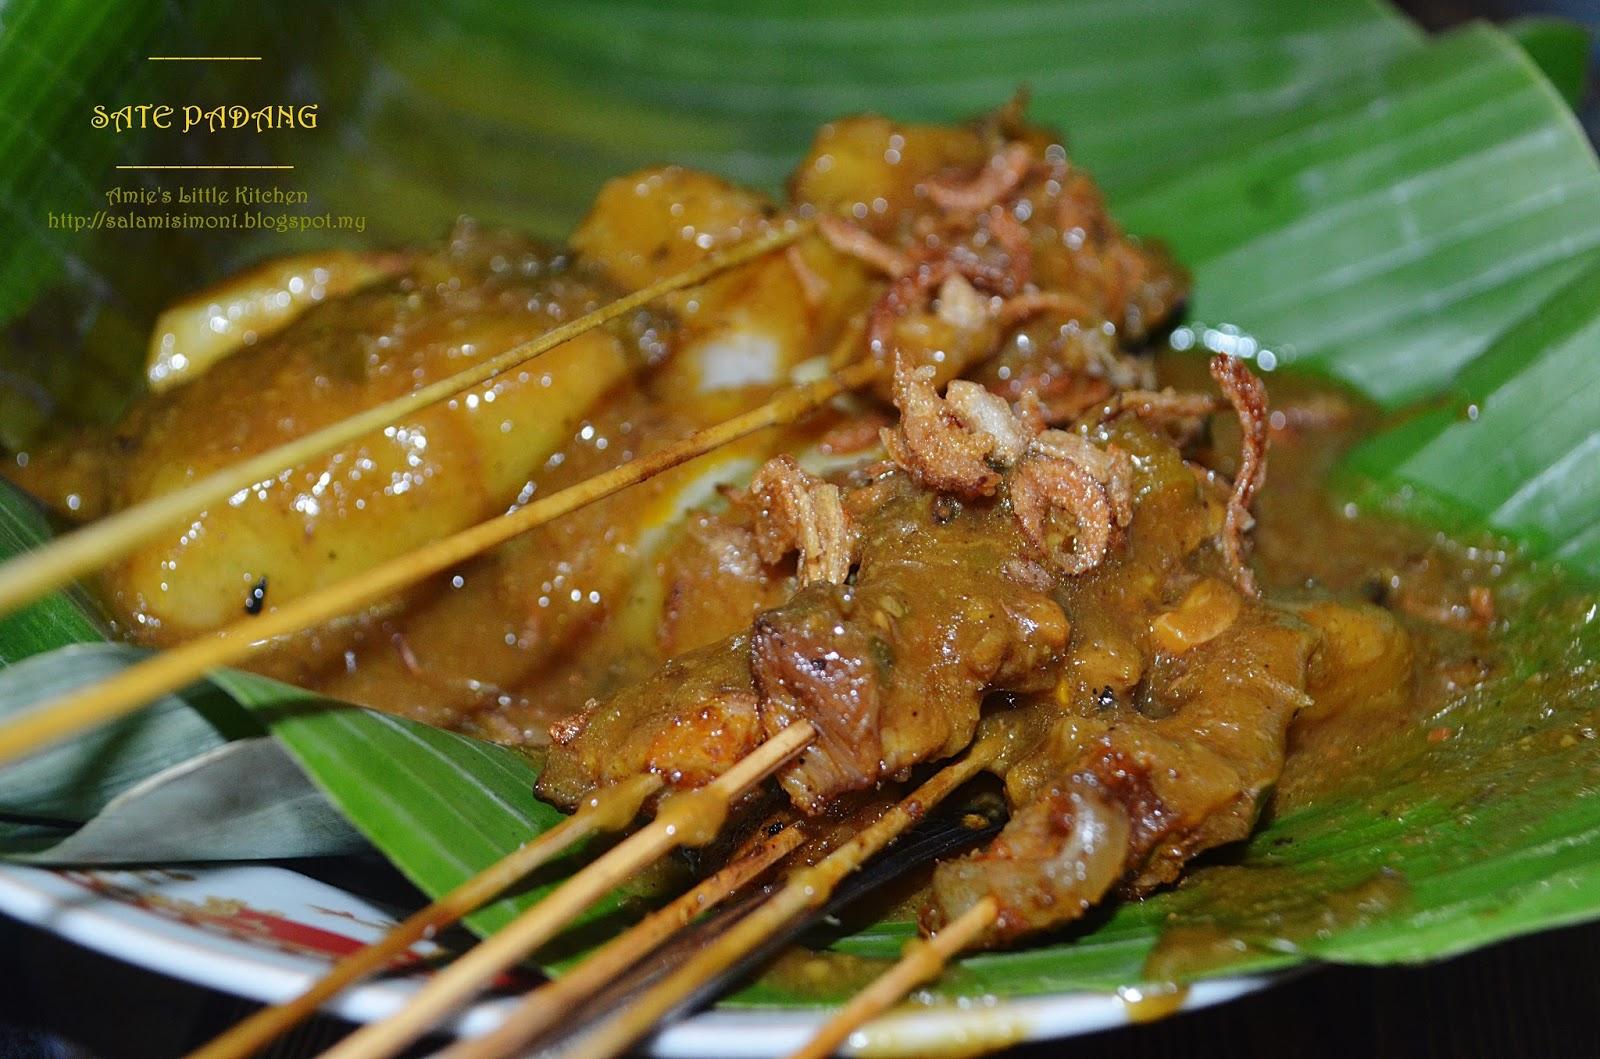 Amie S Little Kitchen Sate Padang Kms Saribu Baniah